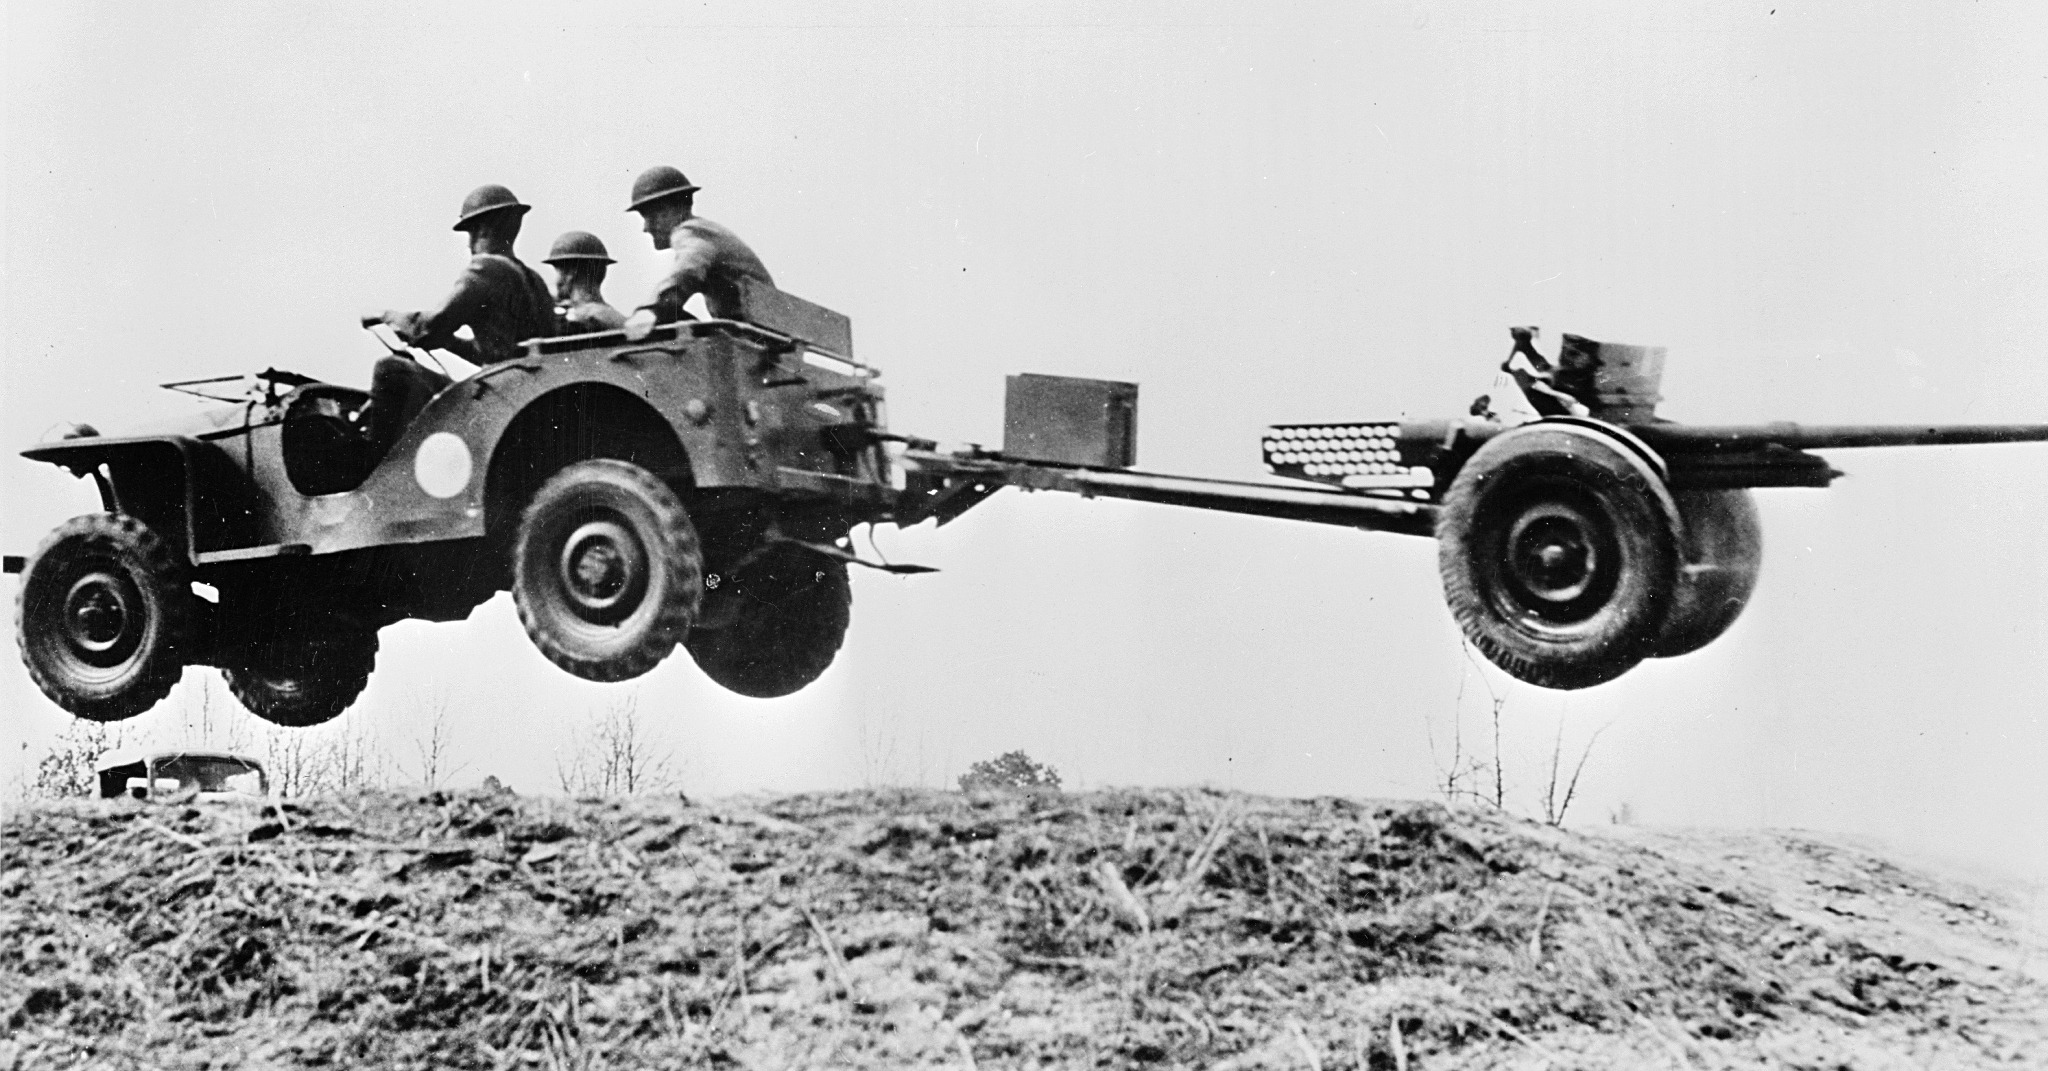 Amercian Bantam BRC40 Jeep airborne gun